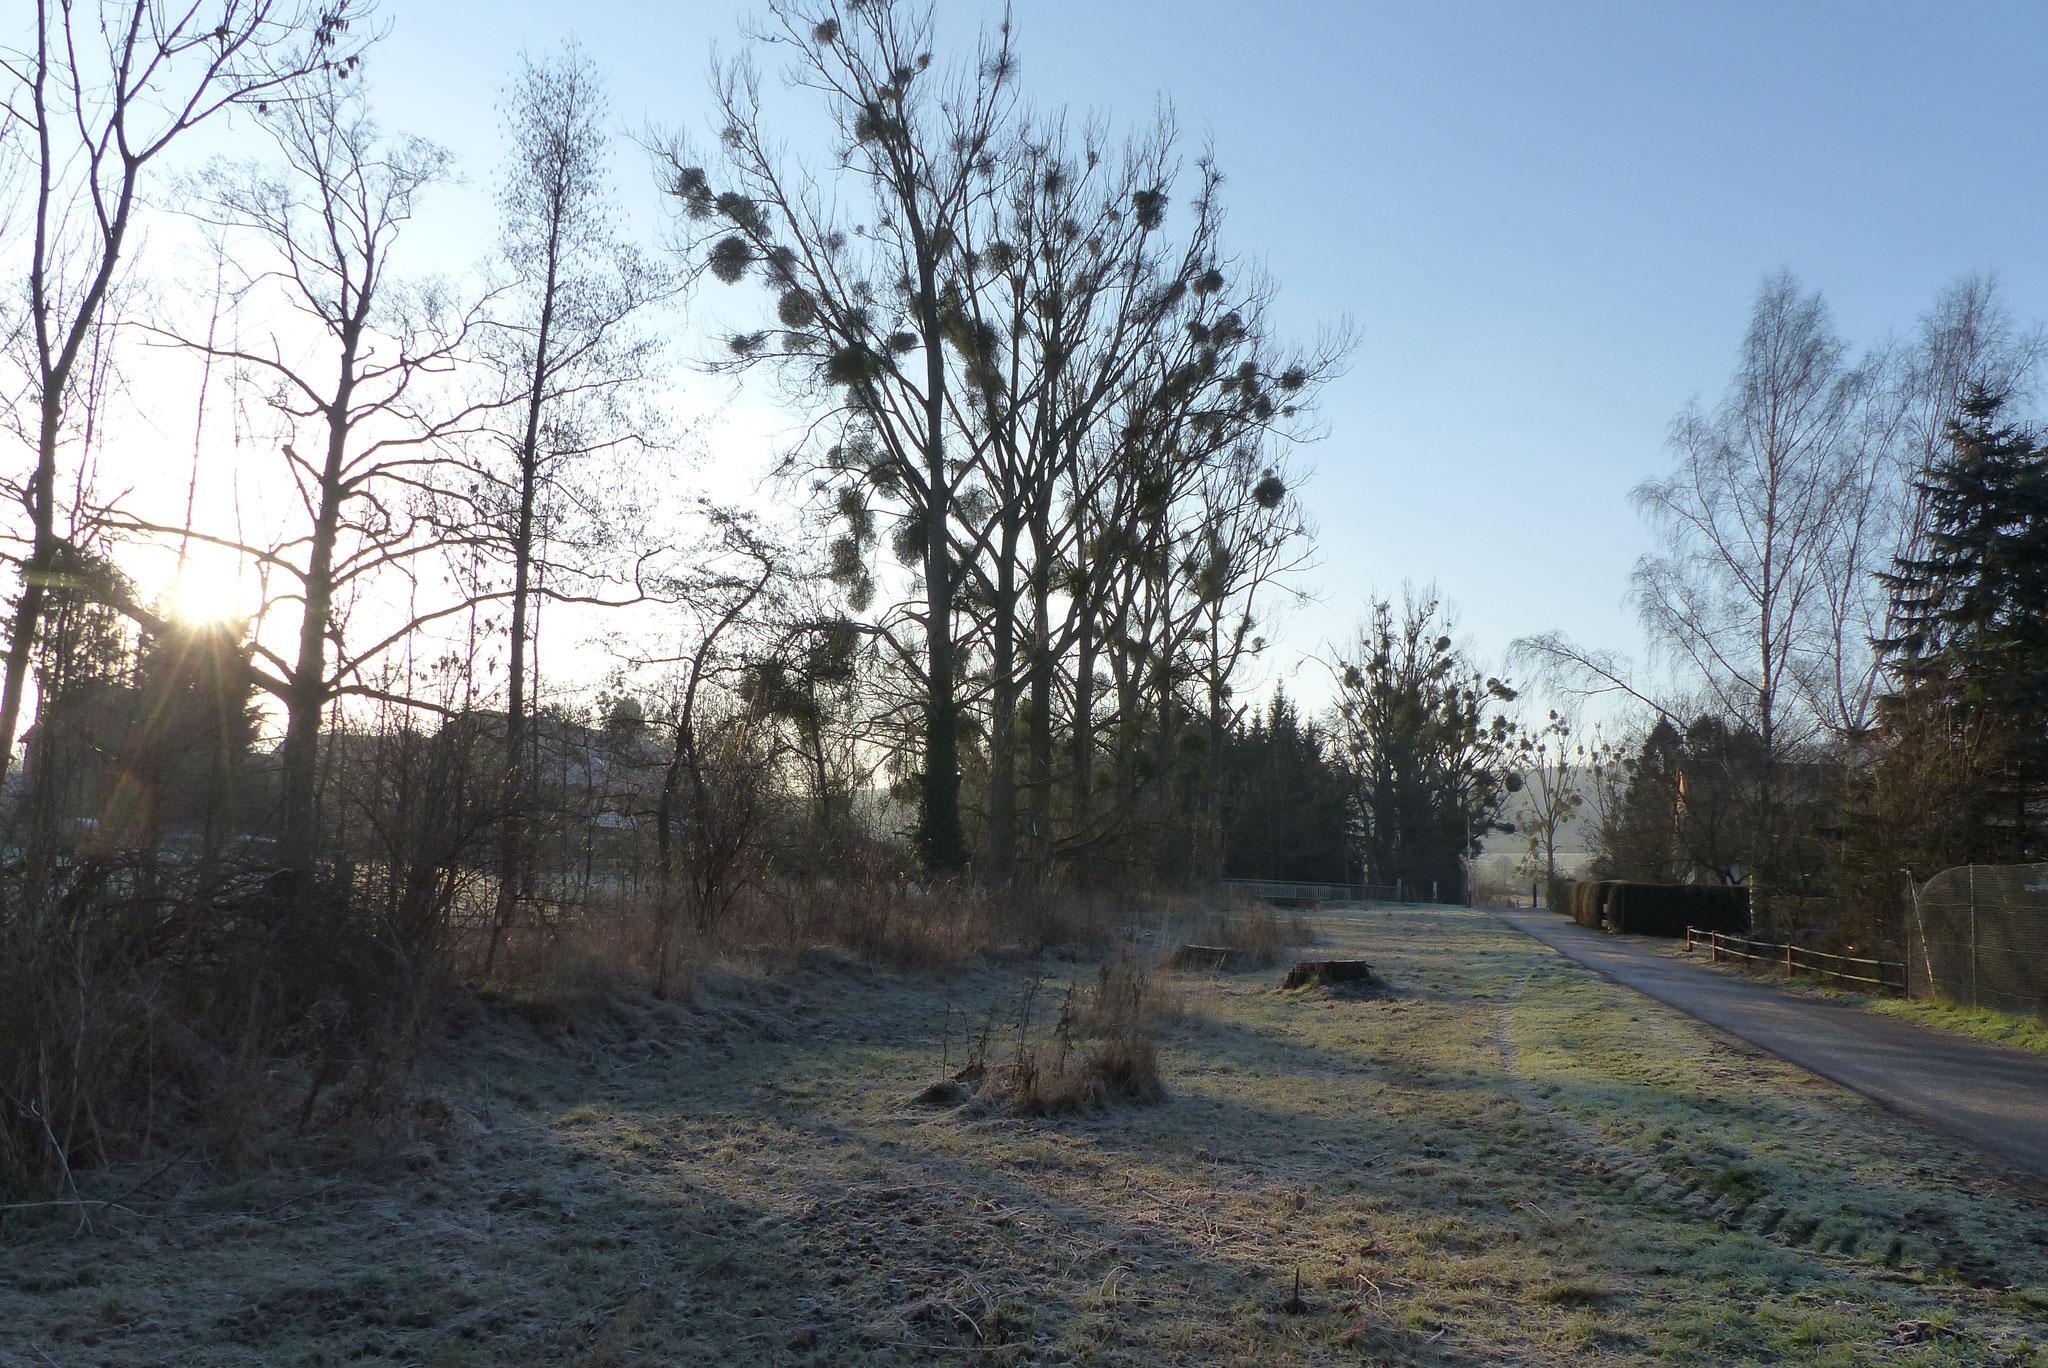 Aue-Wiese im Winter 2018/19 (Foto: M. Wolschke)